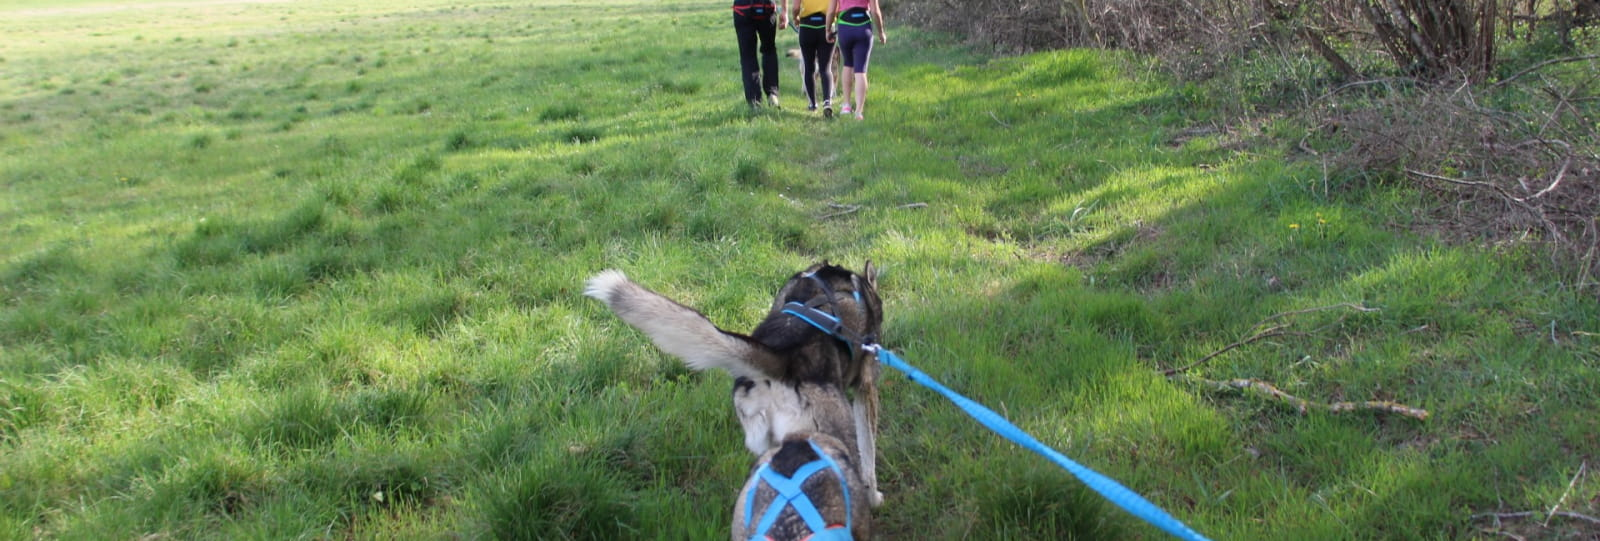 Wood track- cani-rando sportive